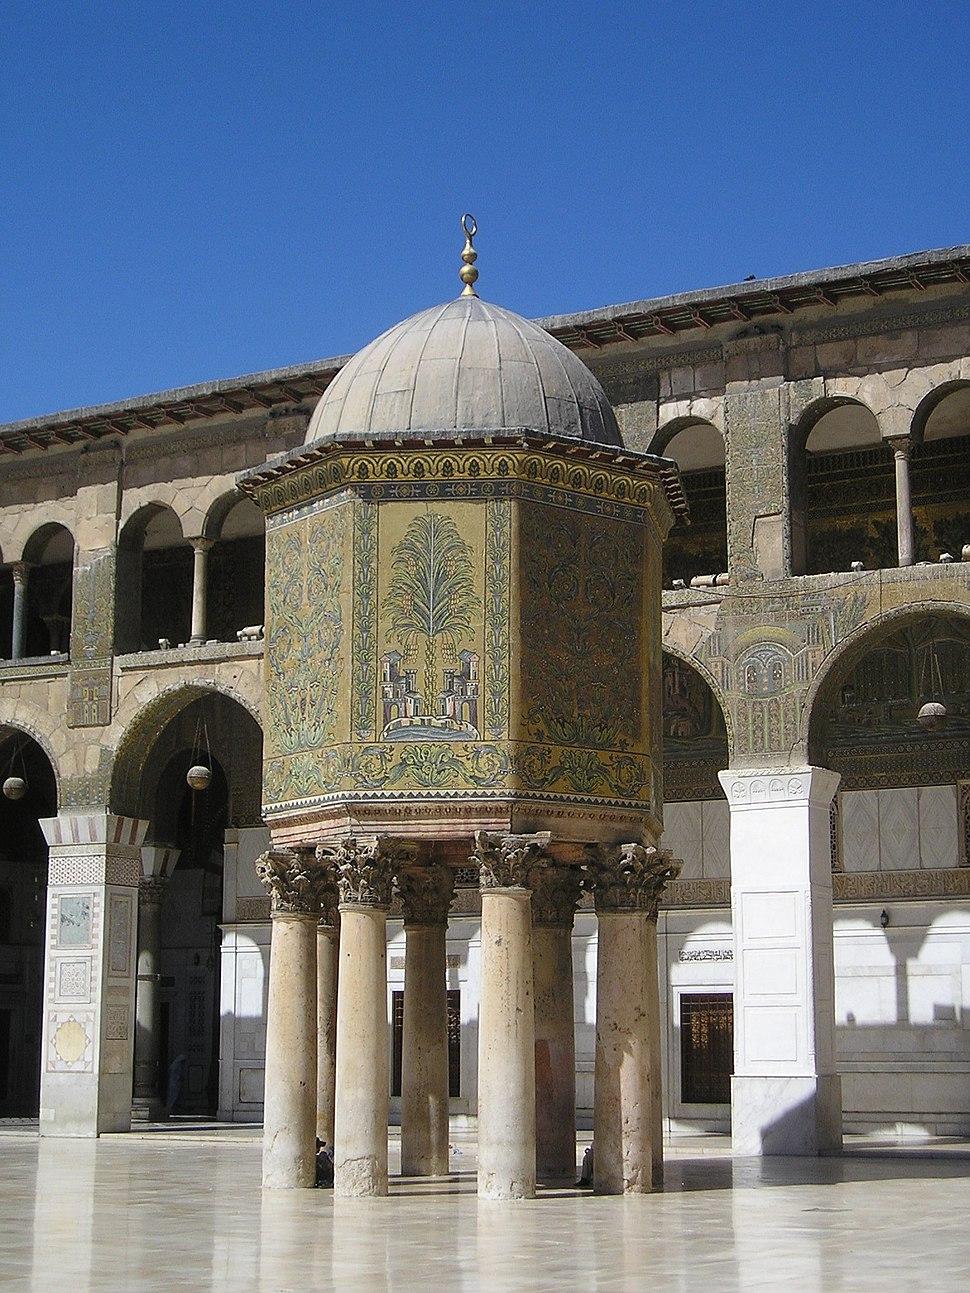 Umayyad Mosque-Dome of the Treasury